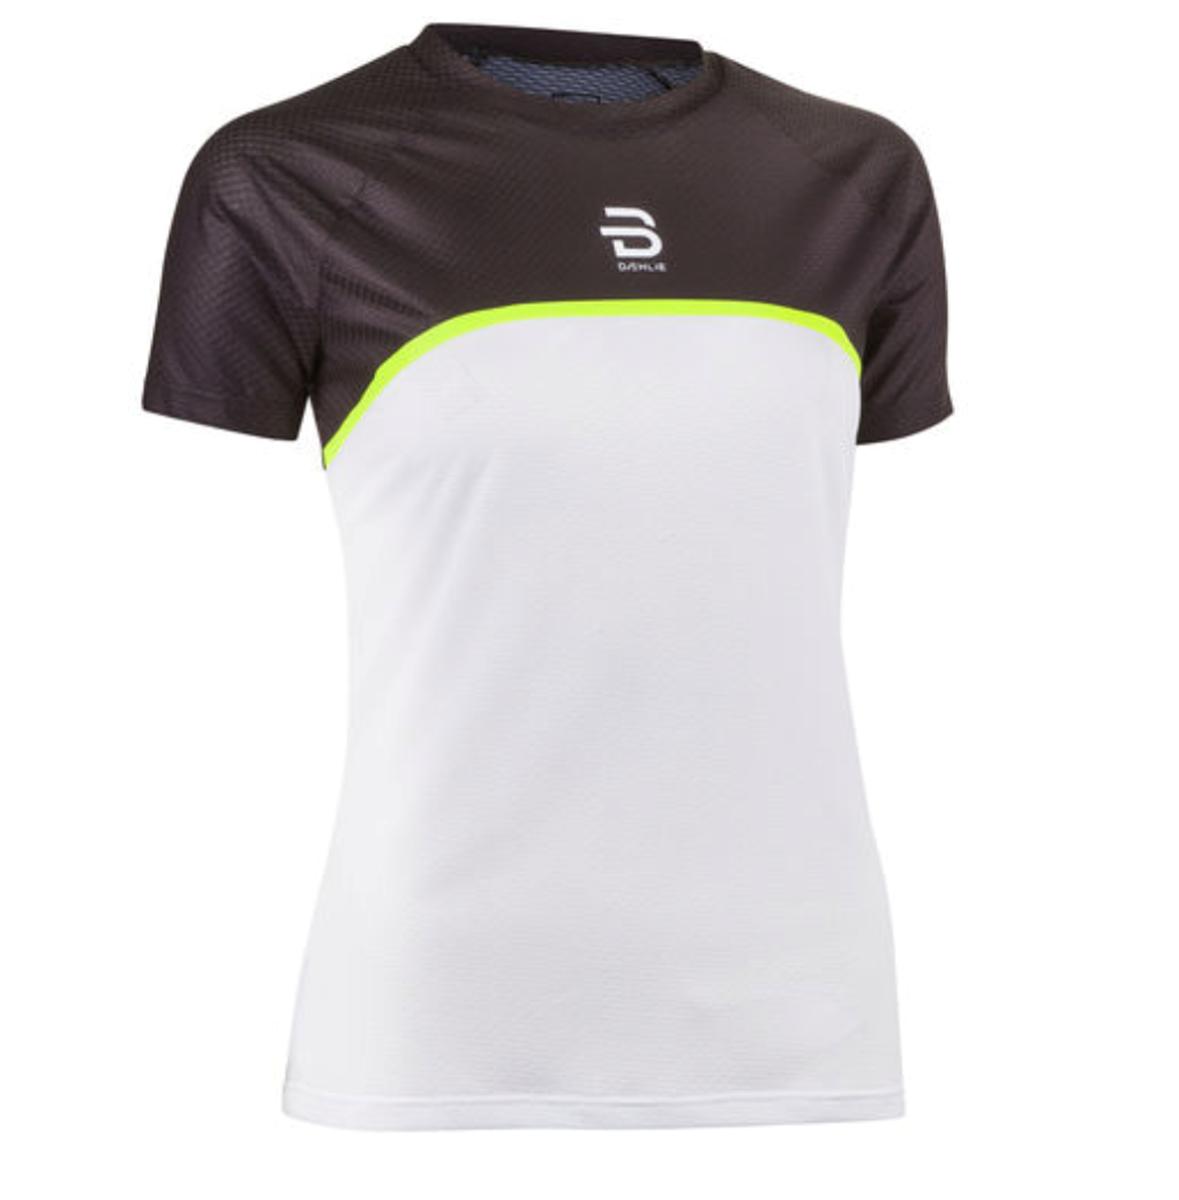 b4a386f5 Dæhlie T-Shirt Raw Athlete Wmn Brilliant White- Nava Sport - Vi ...